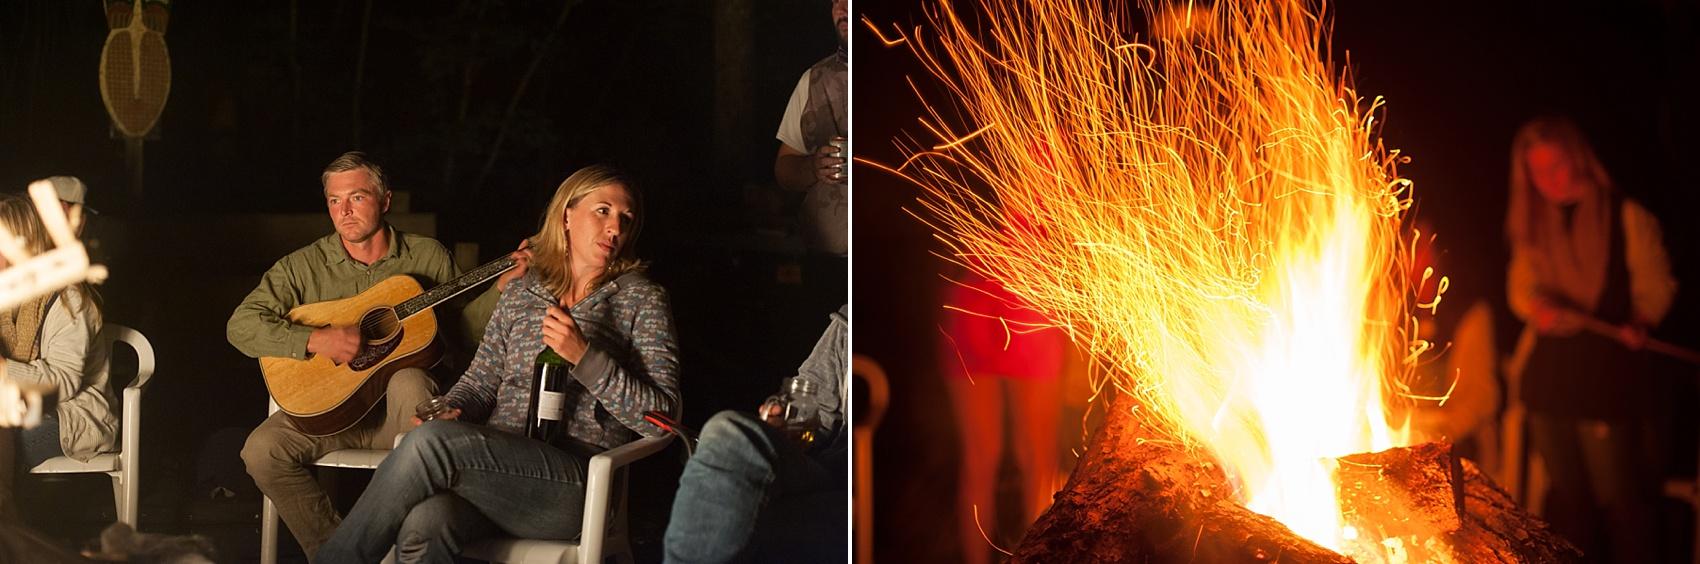 Rustic Berkshires camp wedding bonfire. Photos by Massachusetts wedding photographer, Mikkel Paige Photography.